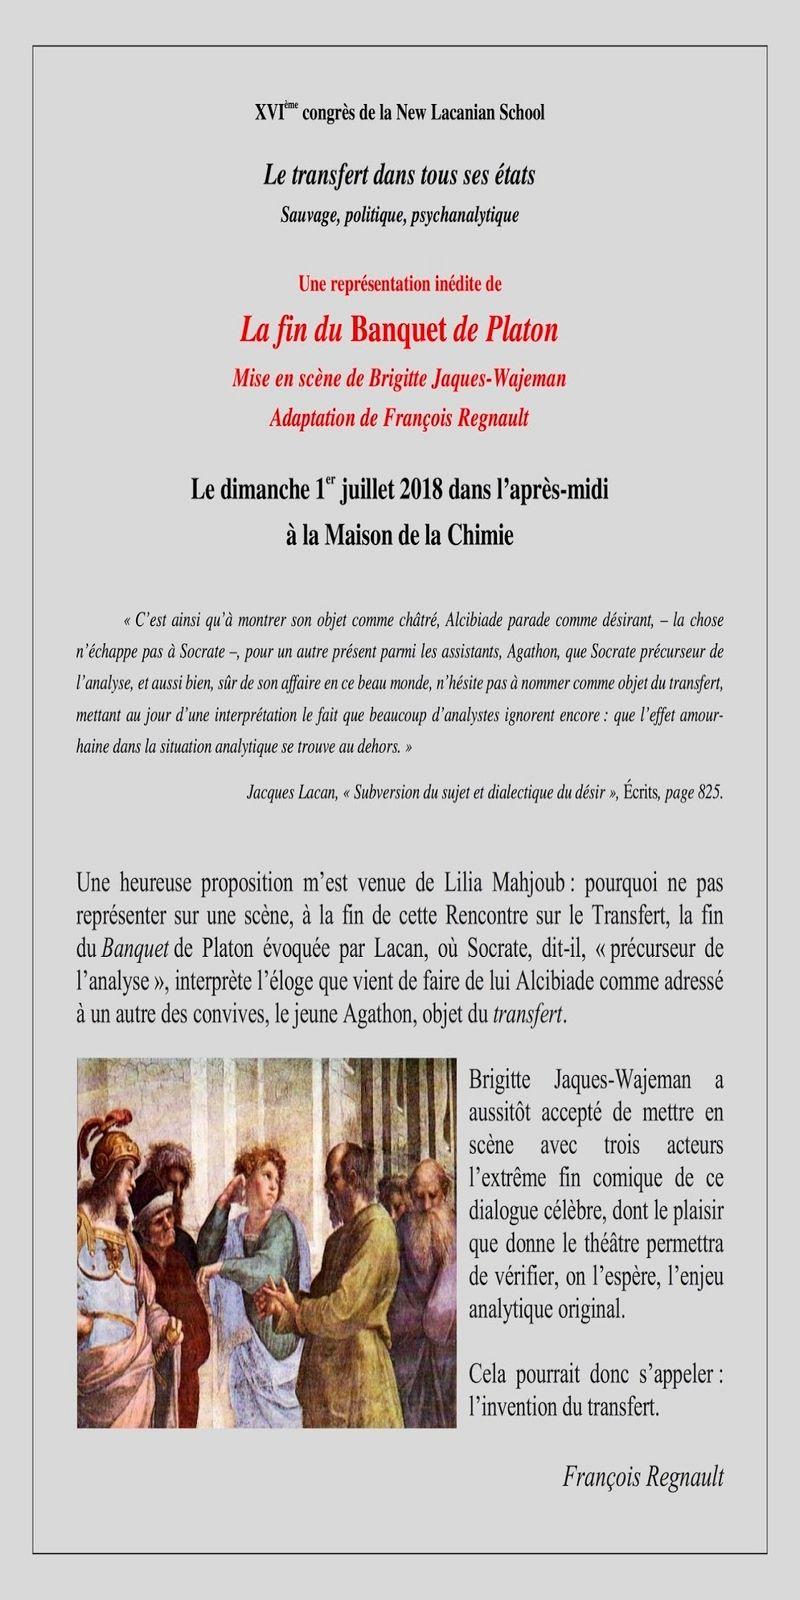 http://nlscongress2018.com/index.php/2018/05/02/dimanche-au-congres-de-la-nls-representation-inedite-de-la-fin-du-banquet-de-platon/